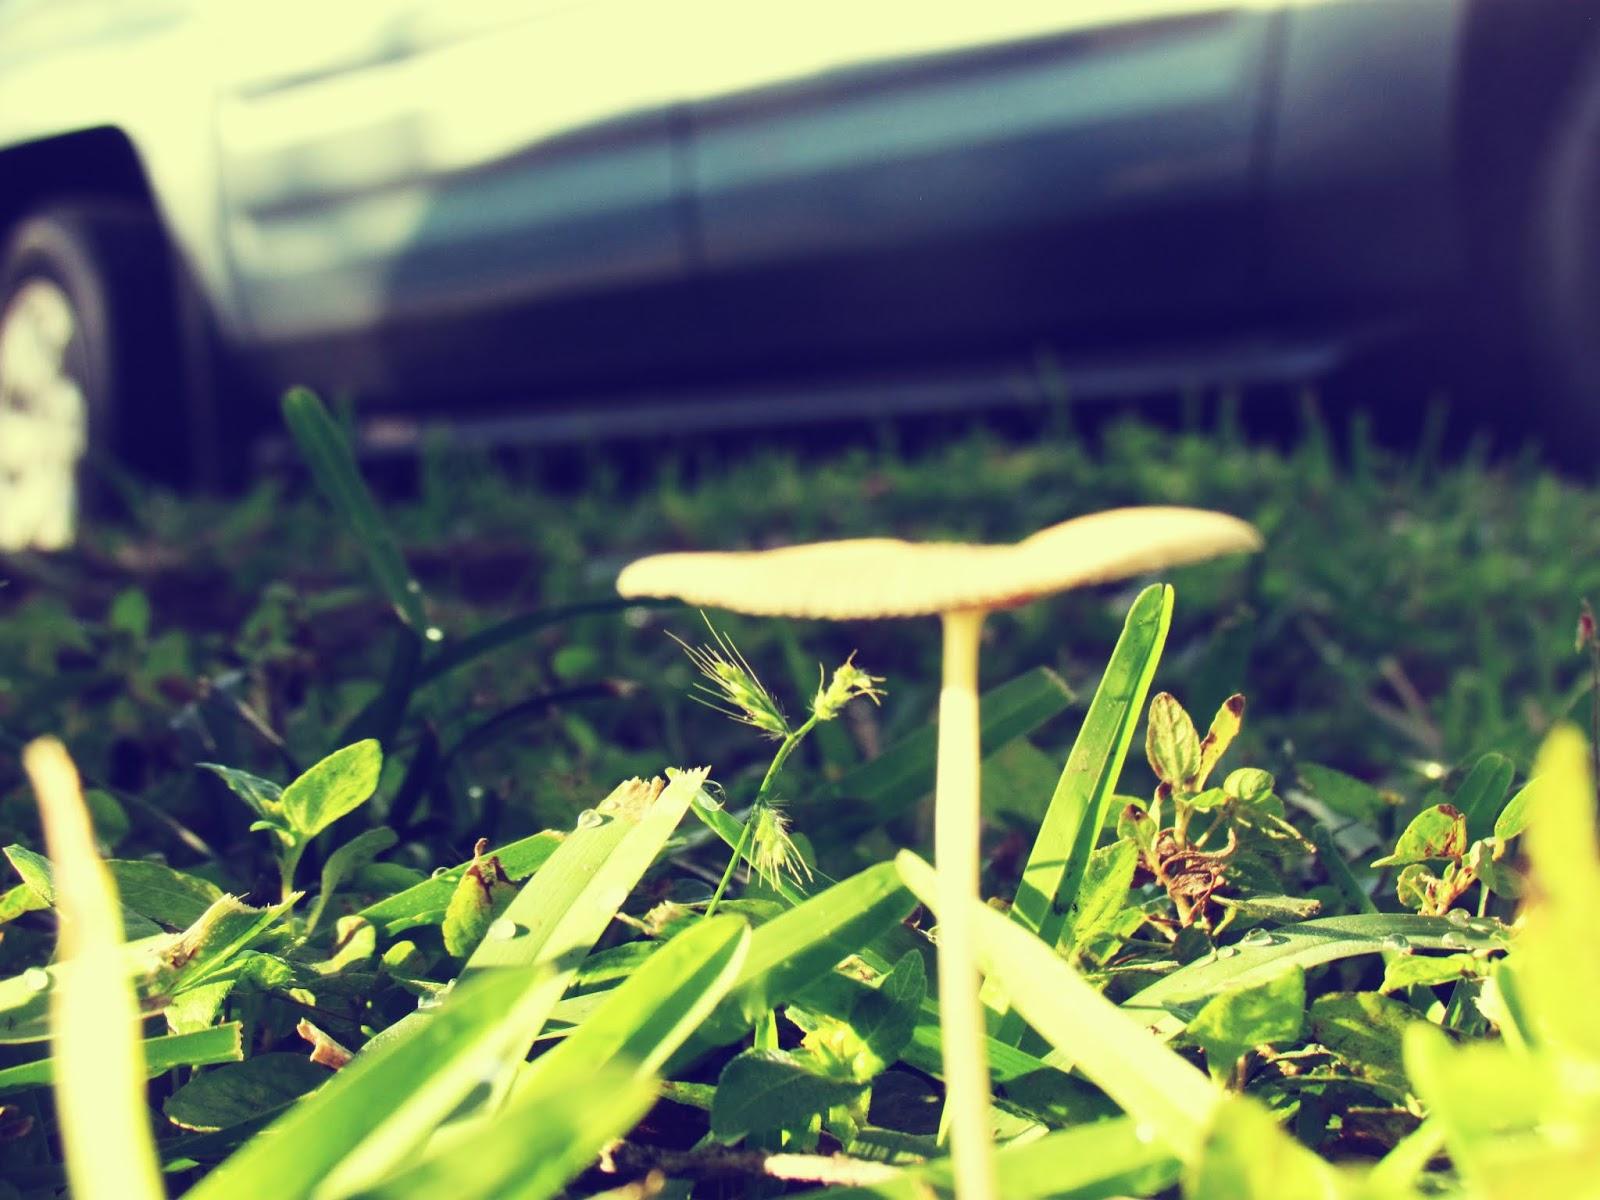 A Skinny Mushroom Fungus Growing By a Car in Urban Neighborhood in Tropical Florida Location